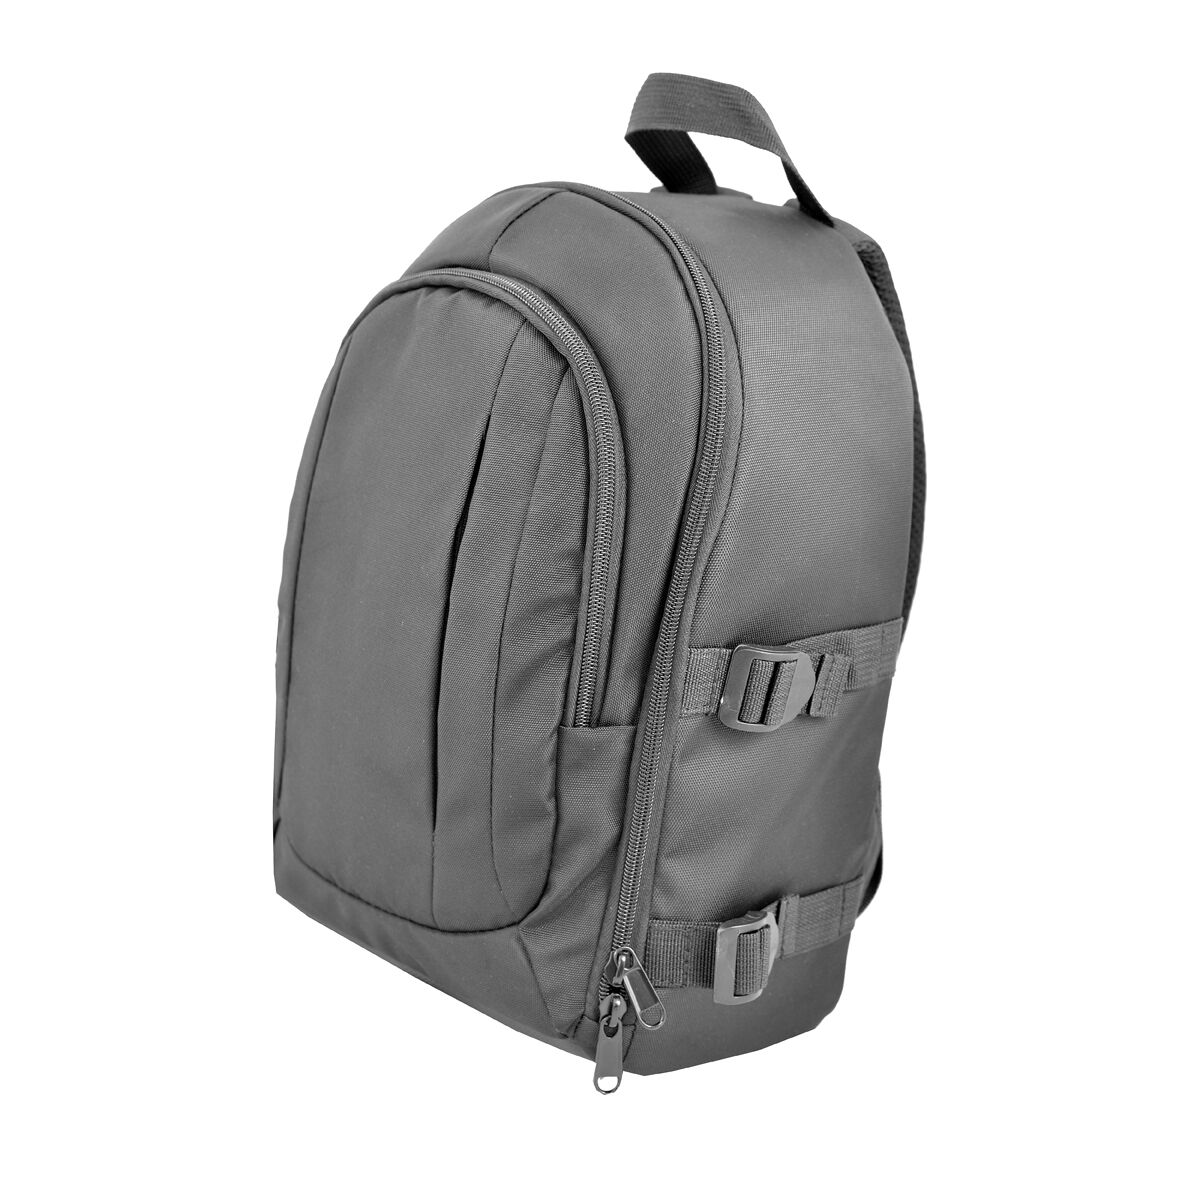 Balck Camera Rucksack Backpack Bag for Canon EOS M100 M50 POWERSHOT SX720 SX540